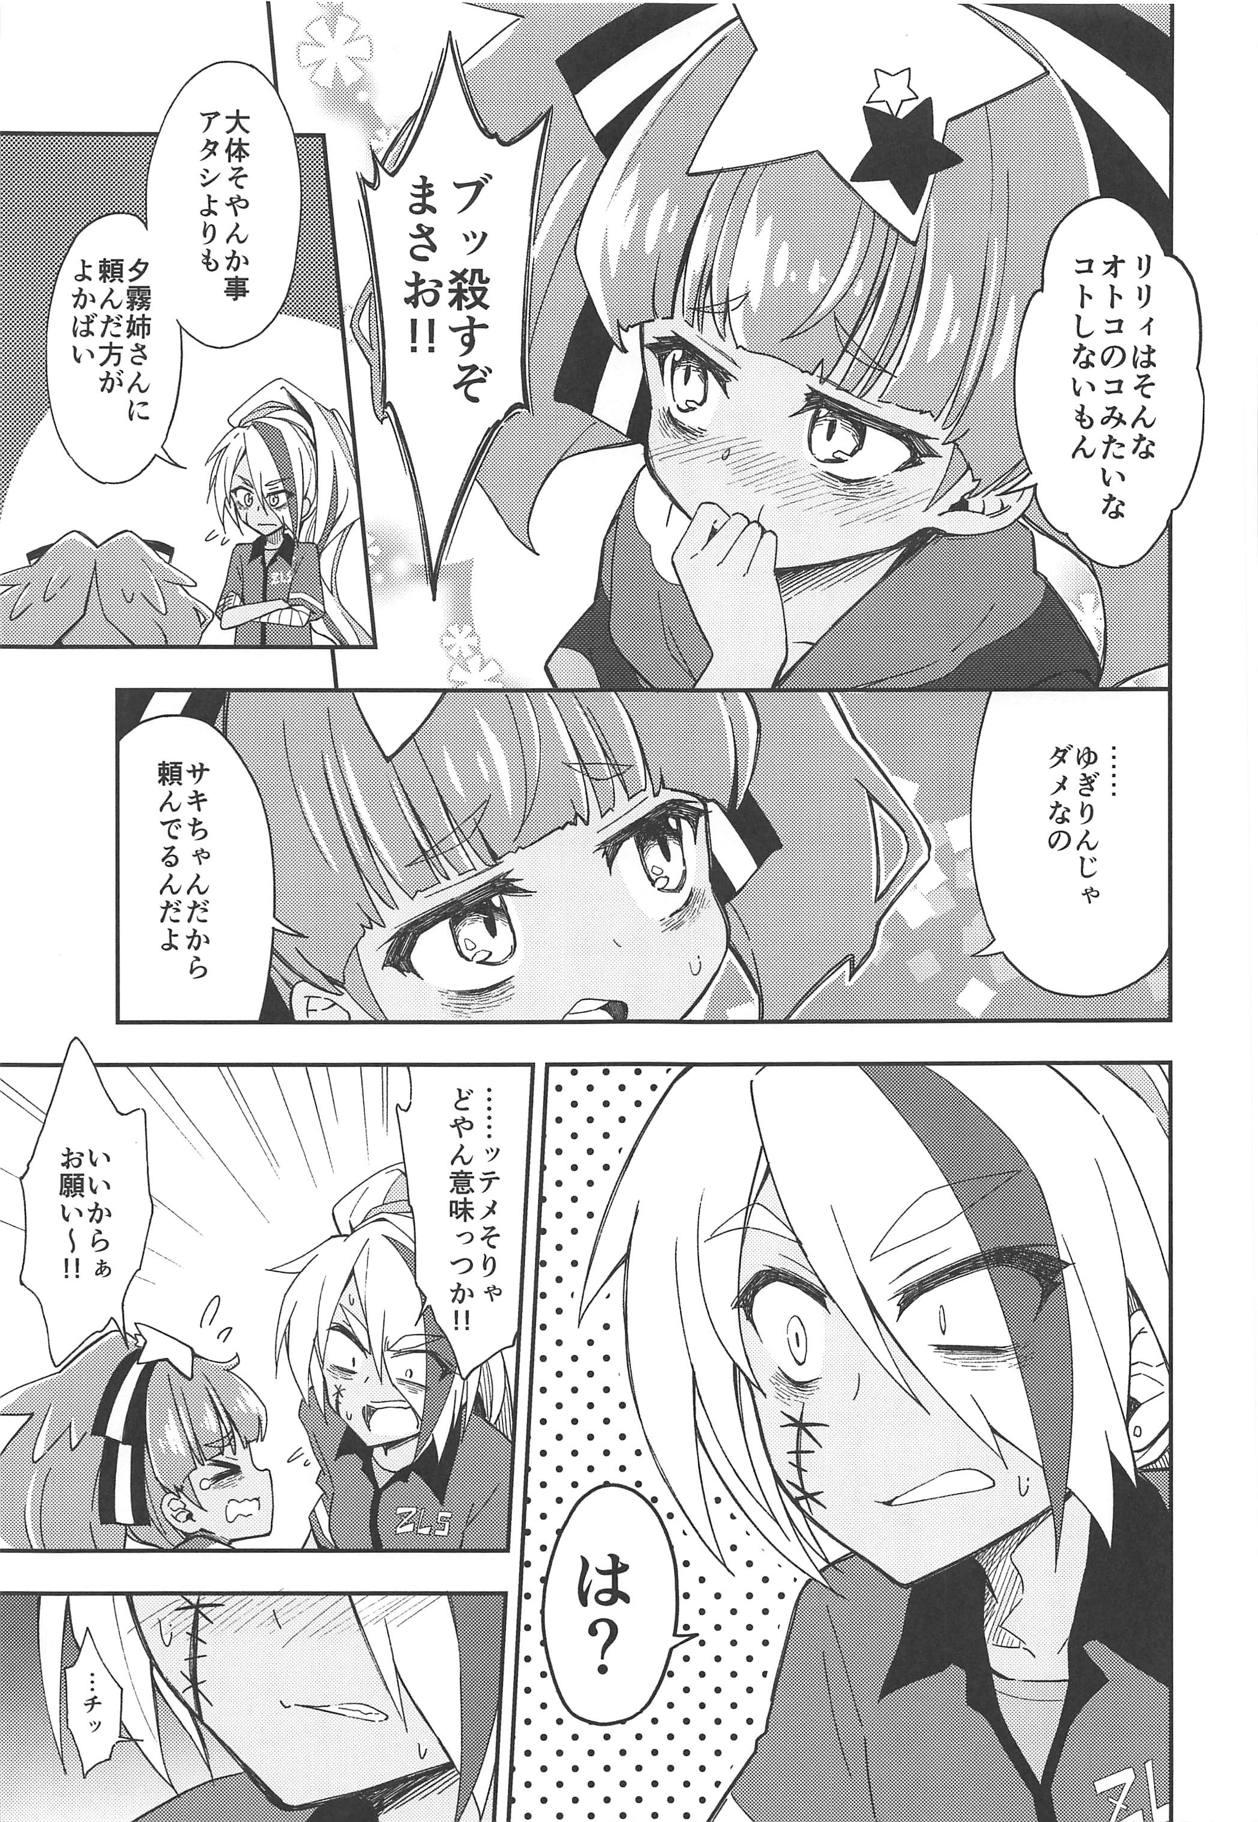 Lovely Girls' Lily Vol. 18 4